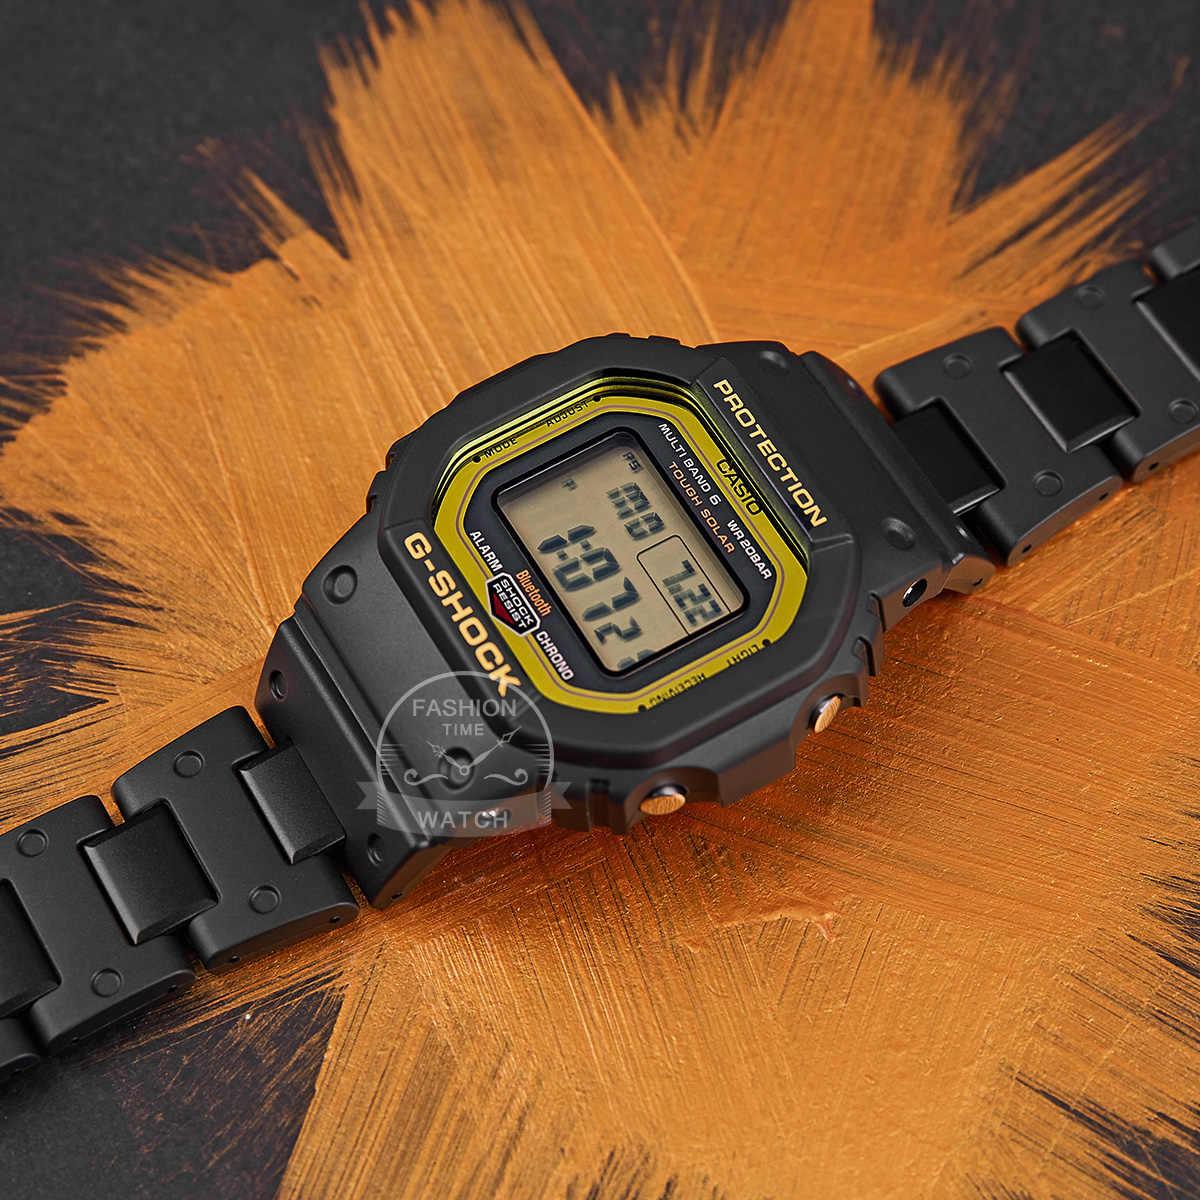 Casio ดูสมาร์ทผู้ชาย G ช็อกแบรนด์ชั้นนำหรูหราชุด 200 เมตรกันน้ำกีฬานาฬิกาควอตซ์ LED ดิจิตอลทหารดำน้ำผู้ชายนาฬิกา G- Shock พลังงานแสงอาทิตย์บลูทู ธ 6 วงวิทยุควบคุมนาฬิกาข้อมือ relogio masculino reloj hombre erkek kol